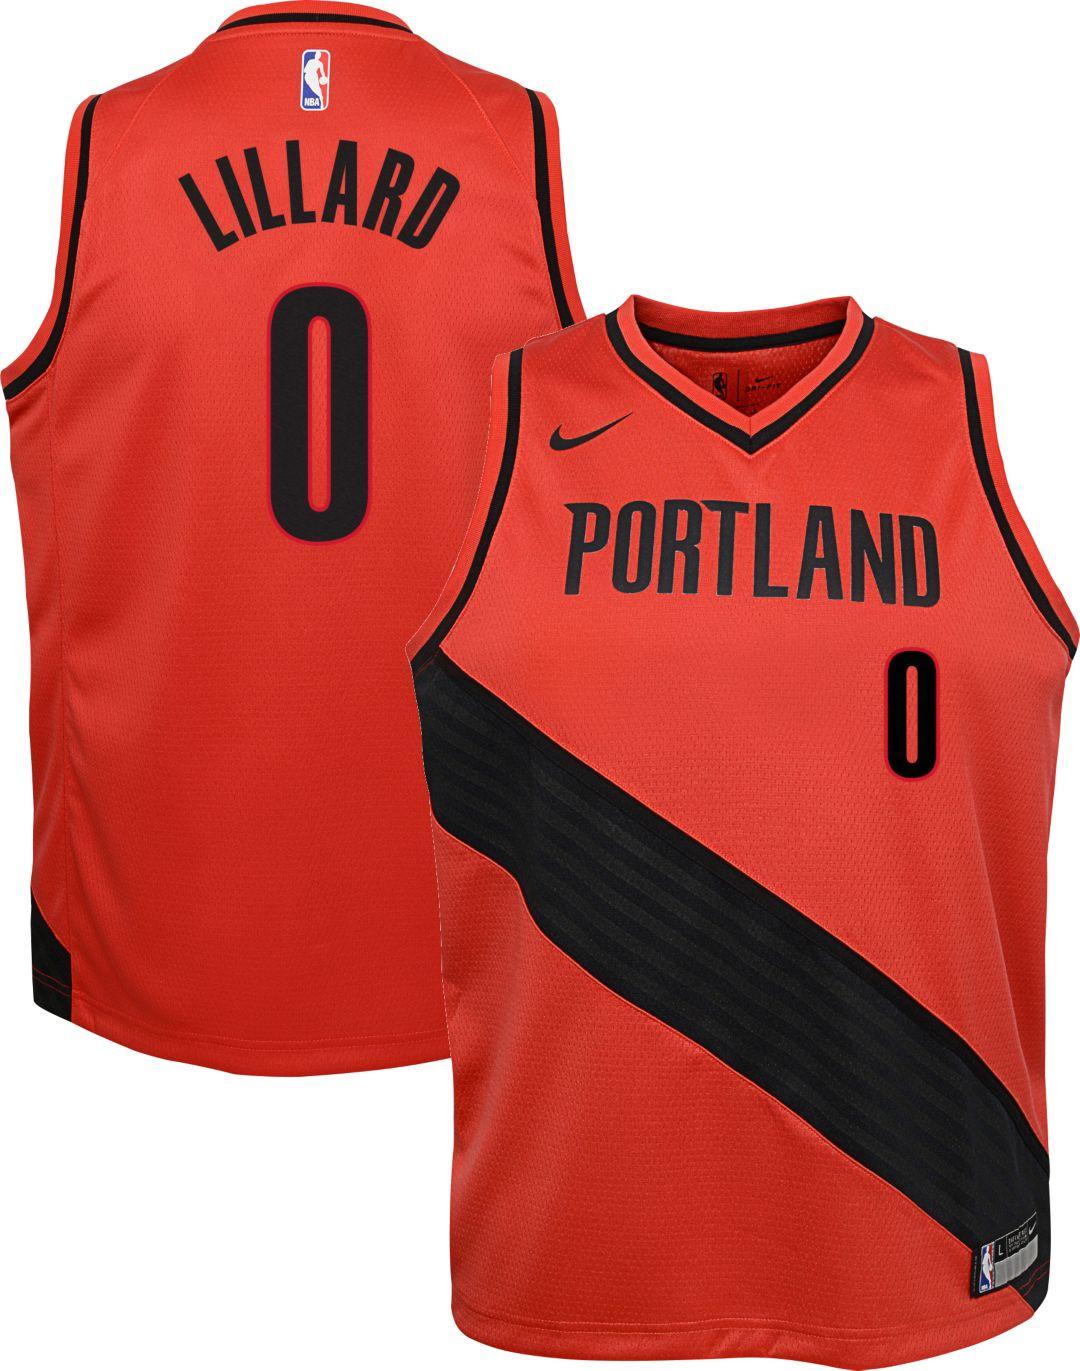 34ff49665 Nike Youth Portland Trail Blazers Damian Lillard #0 Red Dri-FIT ...